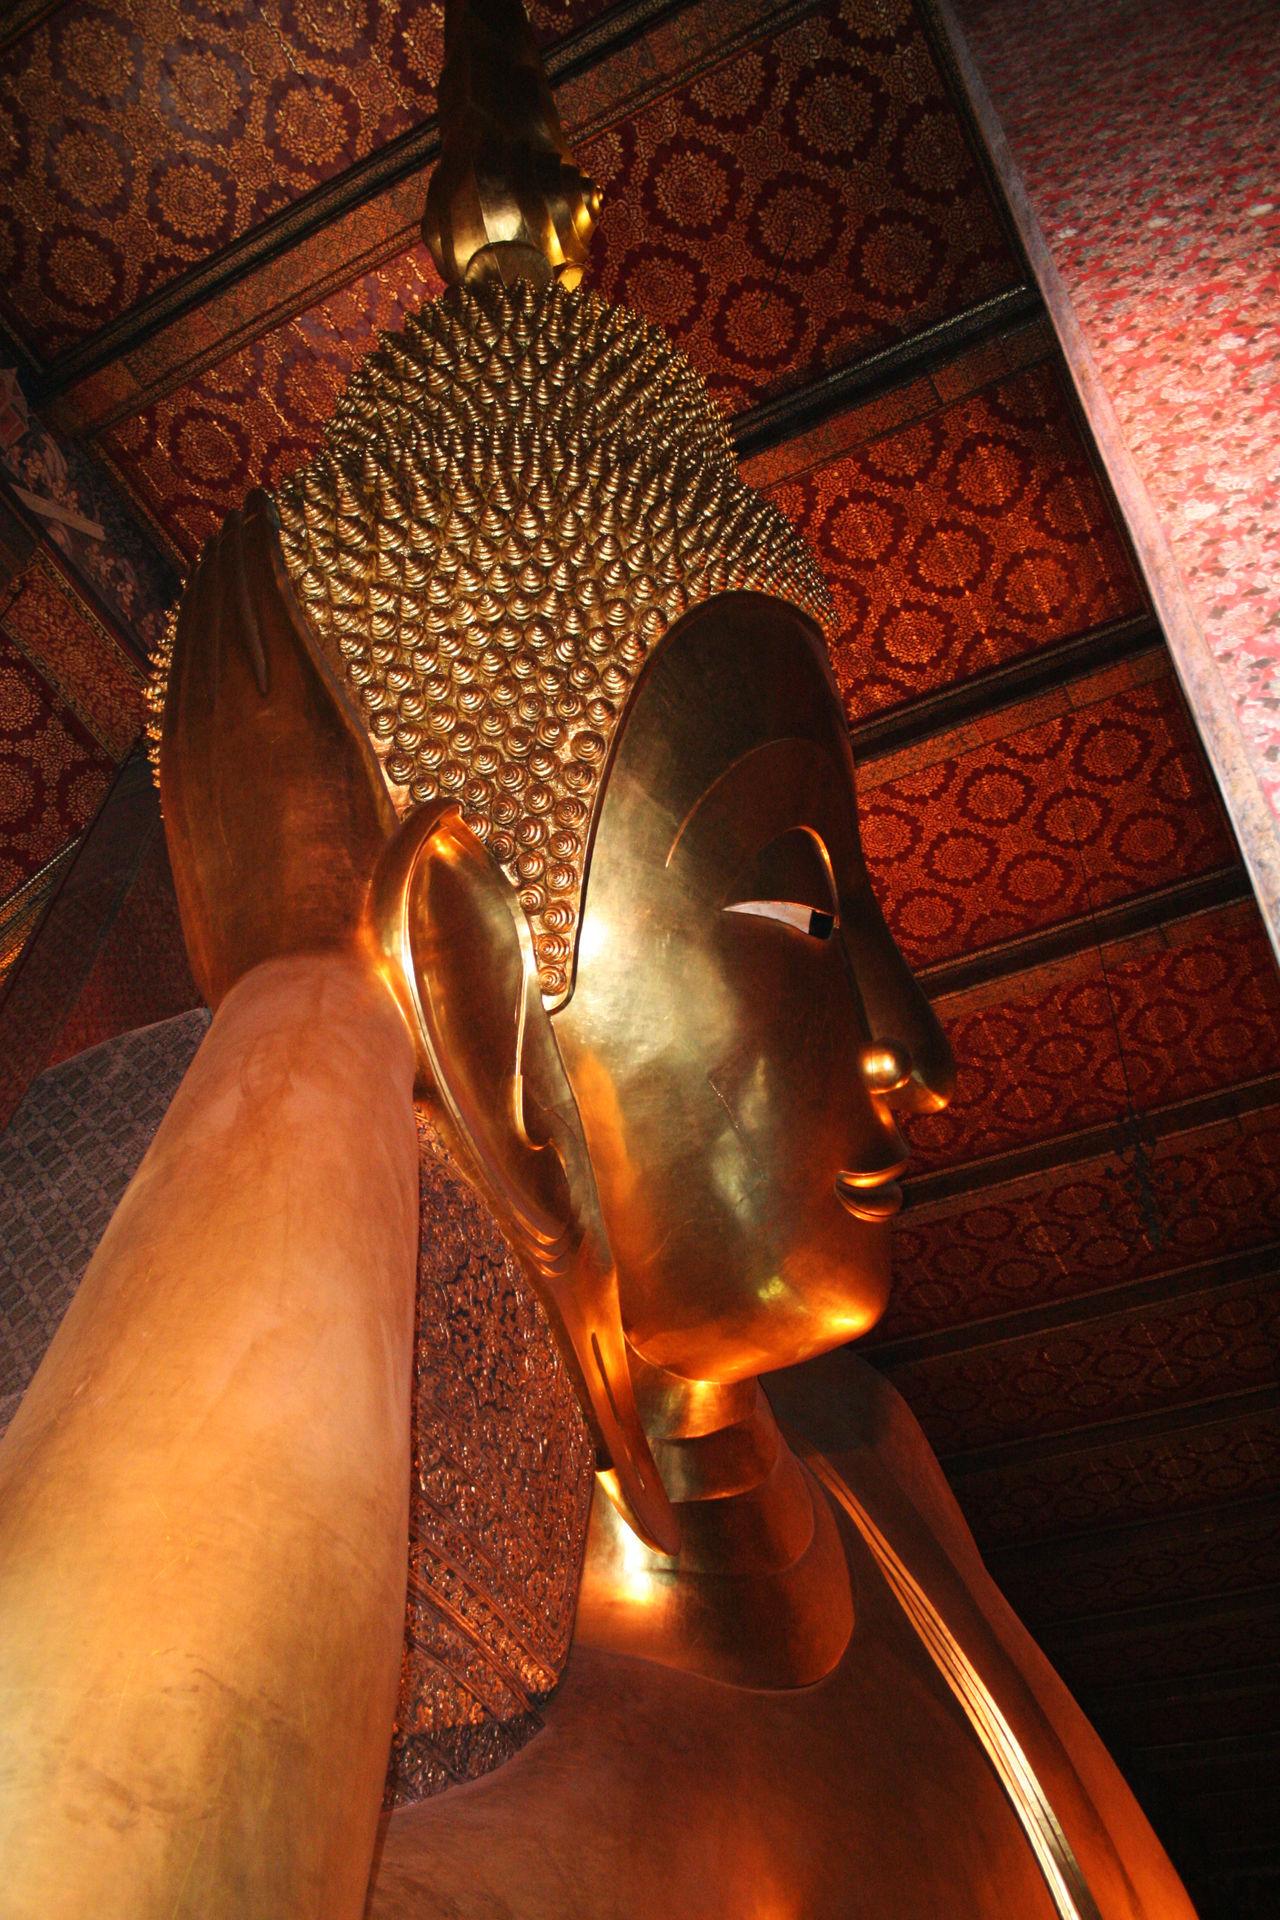 Arts Culture And Entertainment Bangkok Buddha Close-up Golden Illuminated Indoors  Light - Natural Phenomenon Reclining Buddha Religion Spotted In Thailand Statue Thailand